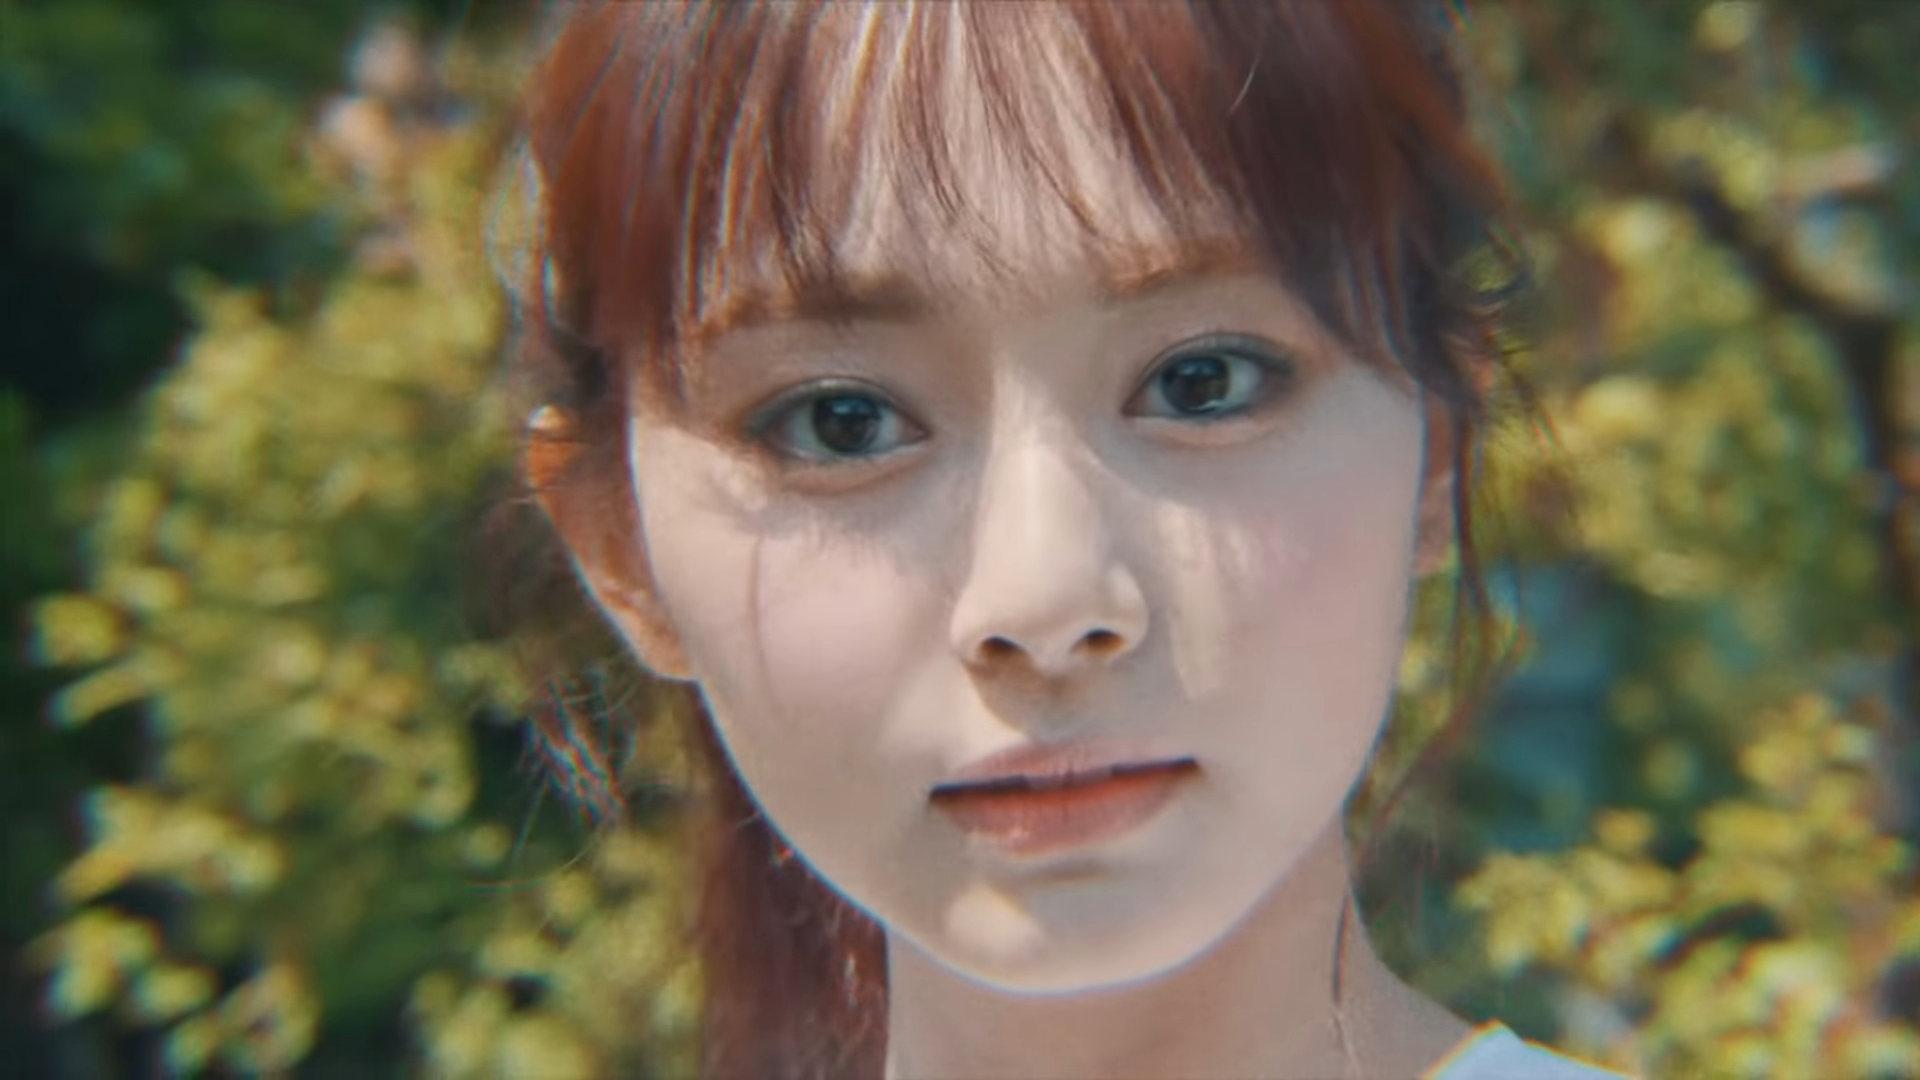 TWICE MORE & MORE Tzuyu Concept Film Screencaps (HD)